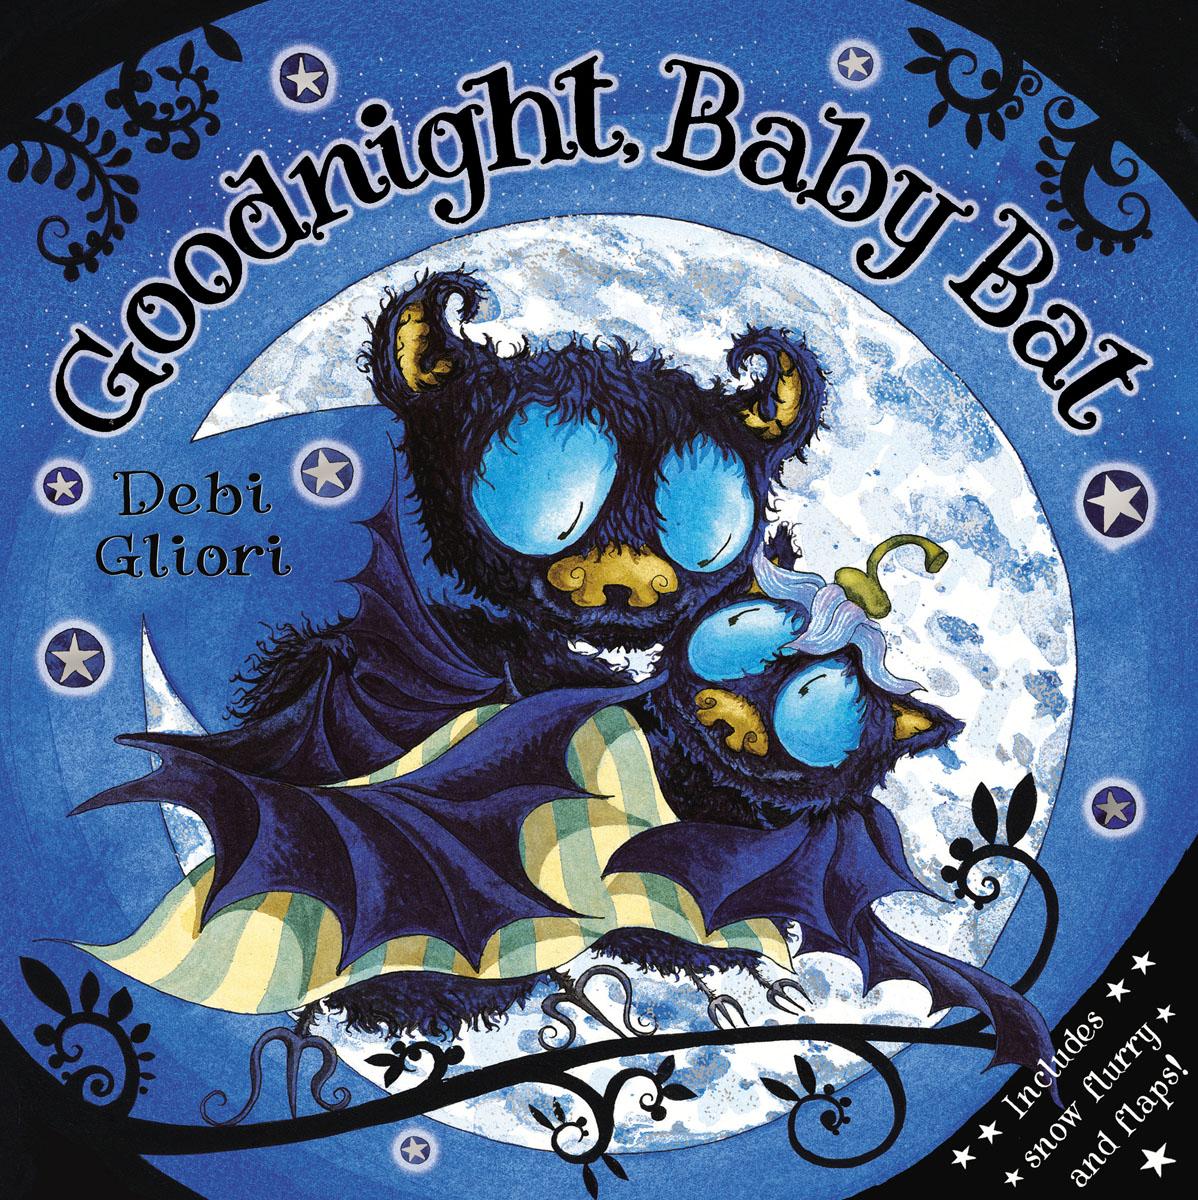 Goodnight, Baby Bat! goodnight punpun volume 3